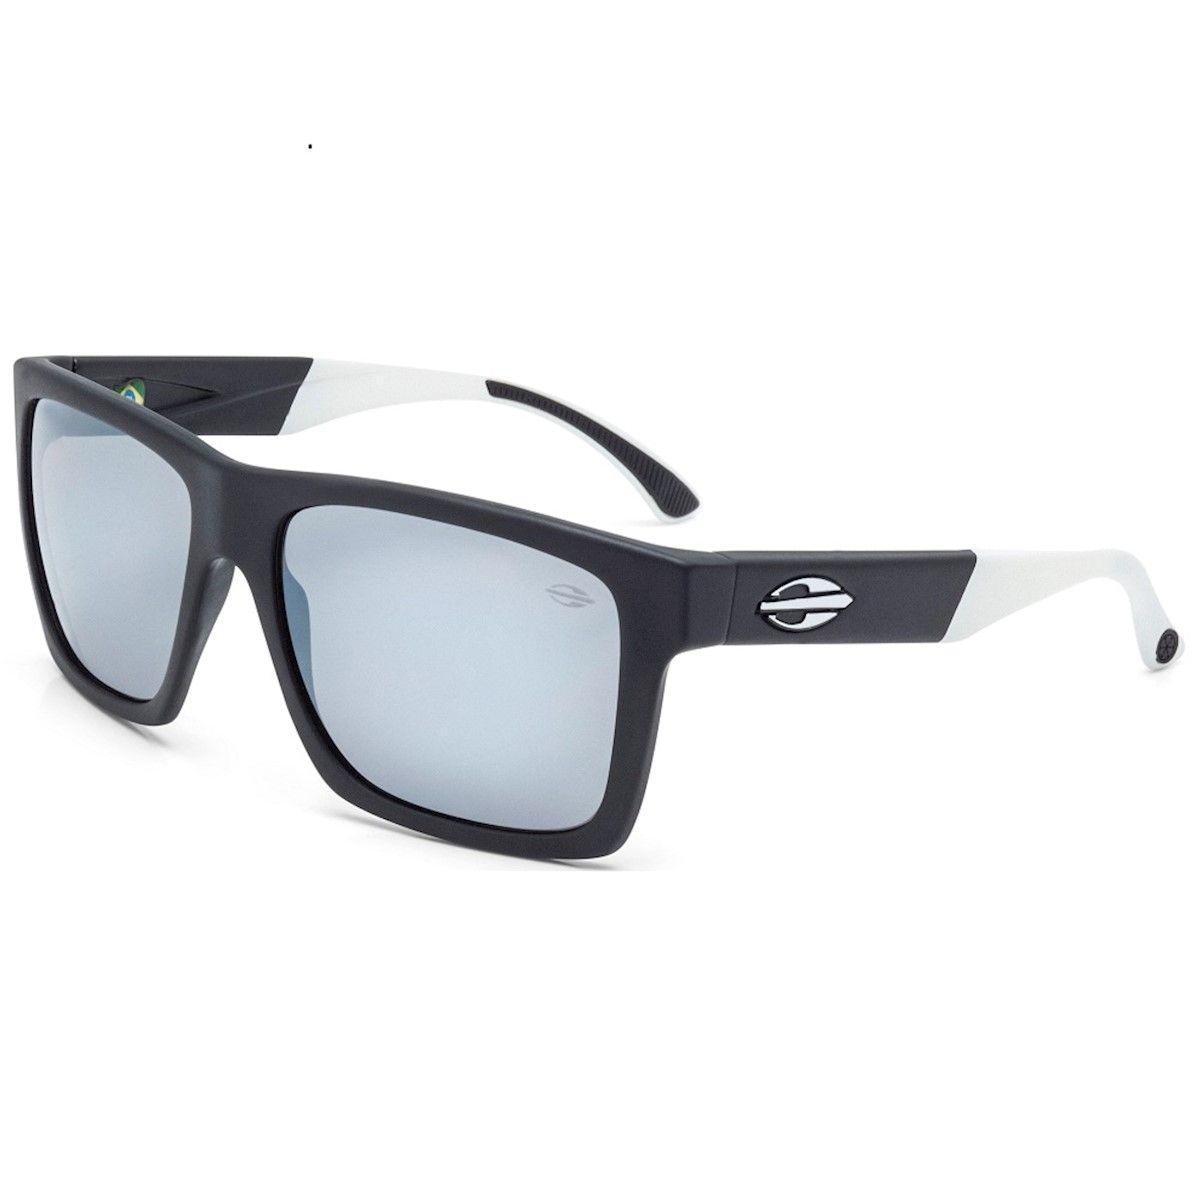 371d8729a797a Óculos de Sol Mormaii San Diego Preto Fosco » Óculos de Sol Mormaii ...